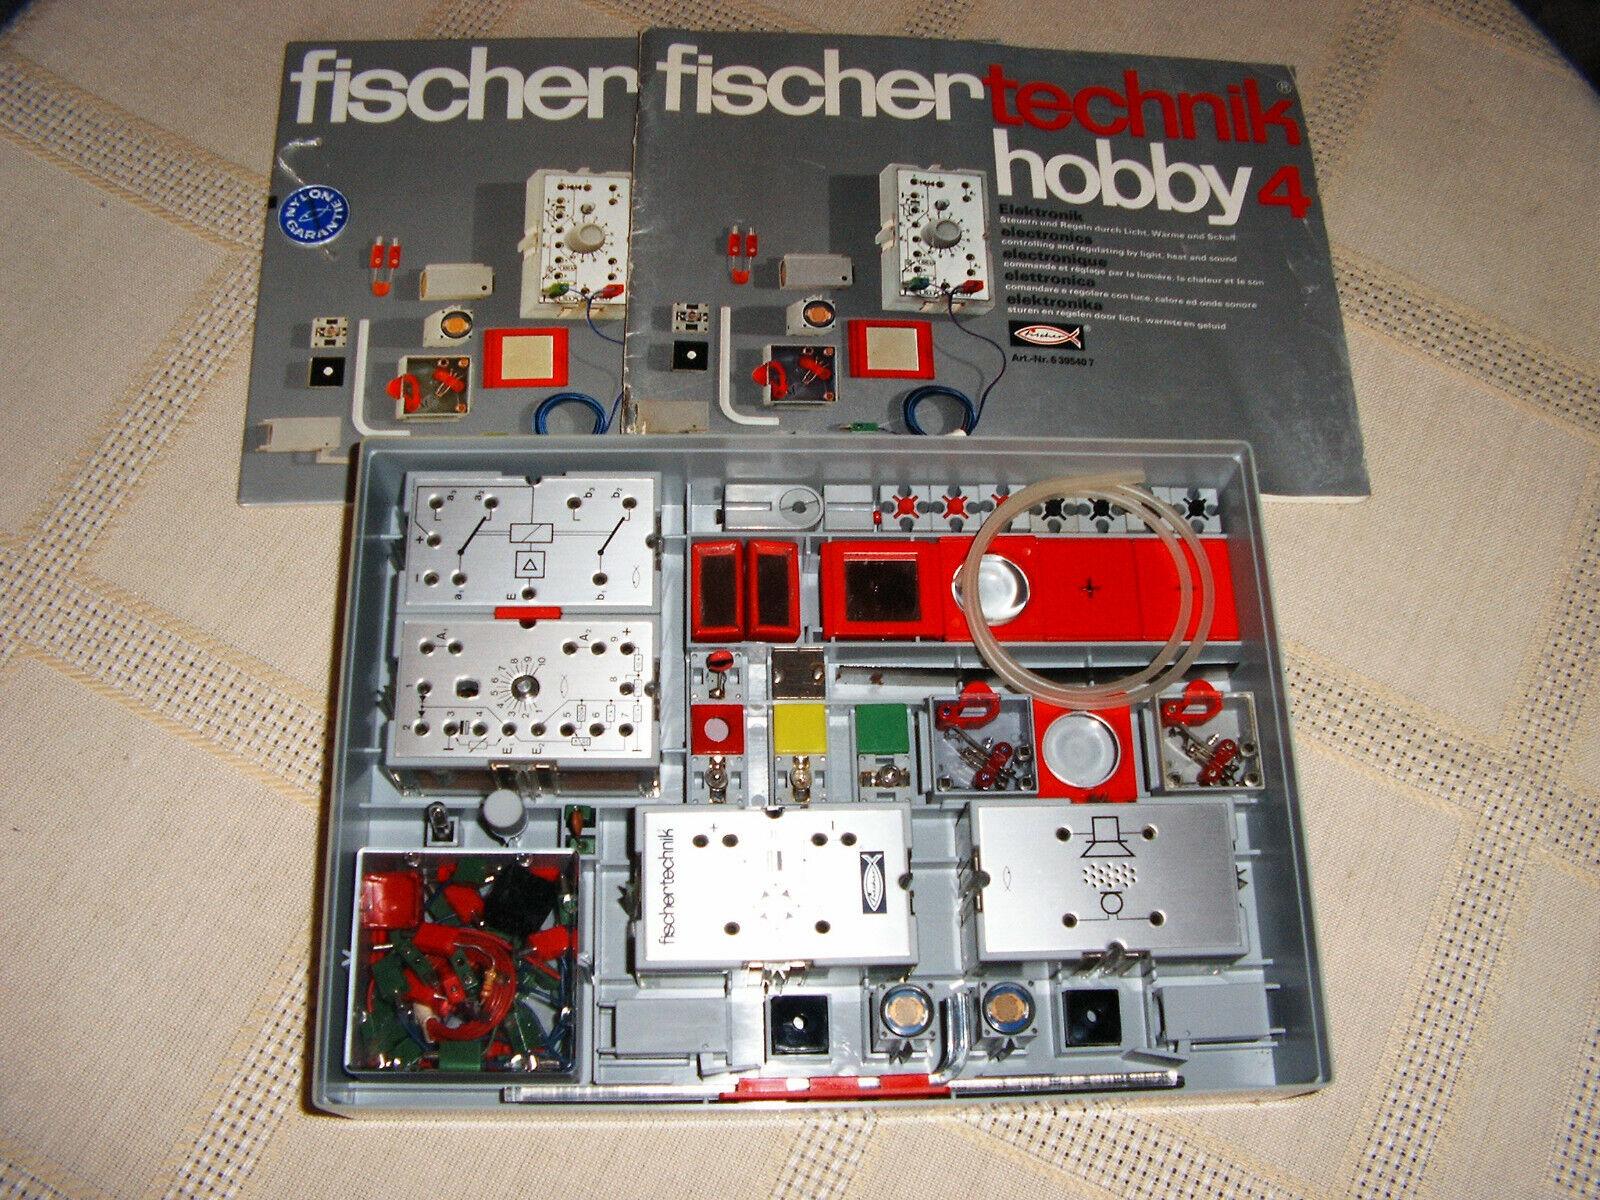 Fischertechnik Baukasten hobby 4, Elektronik, mit Beschreibung, TOP